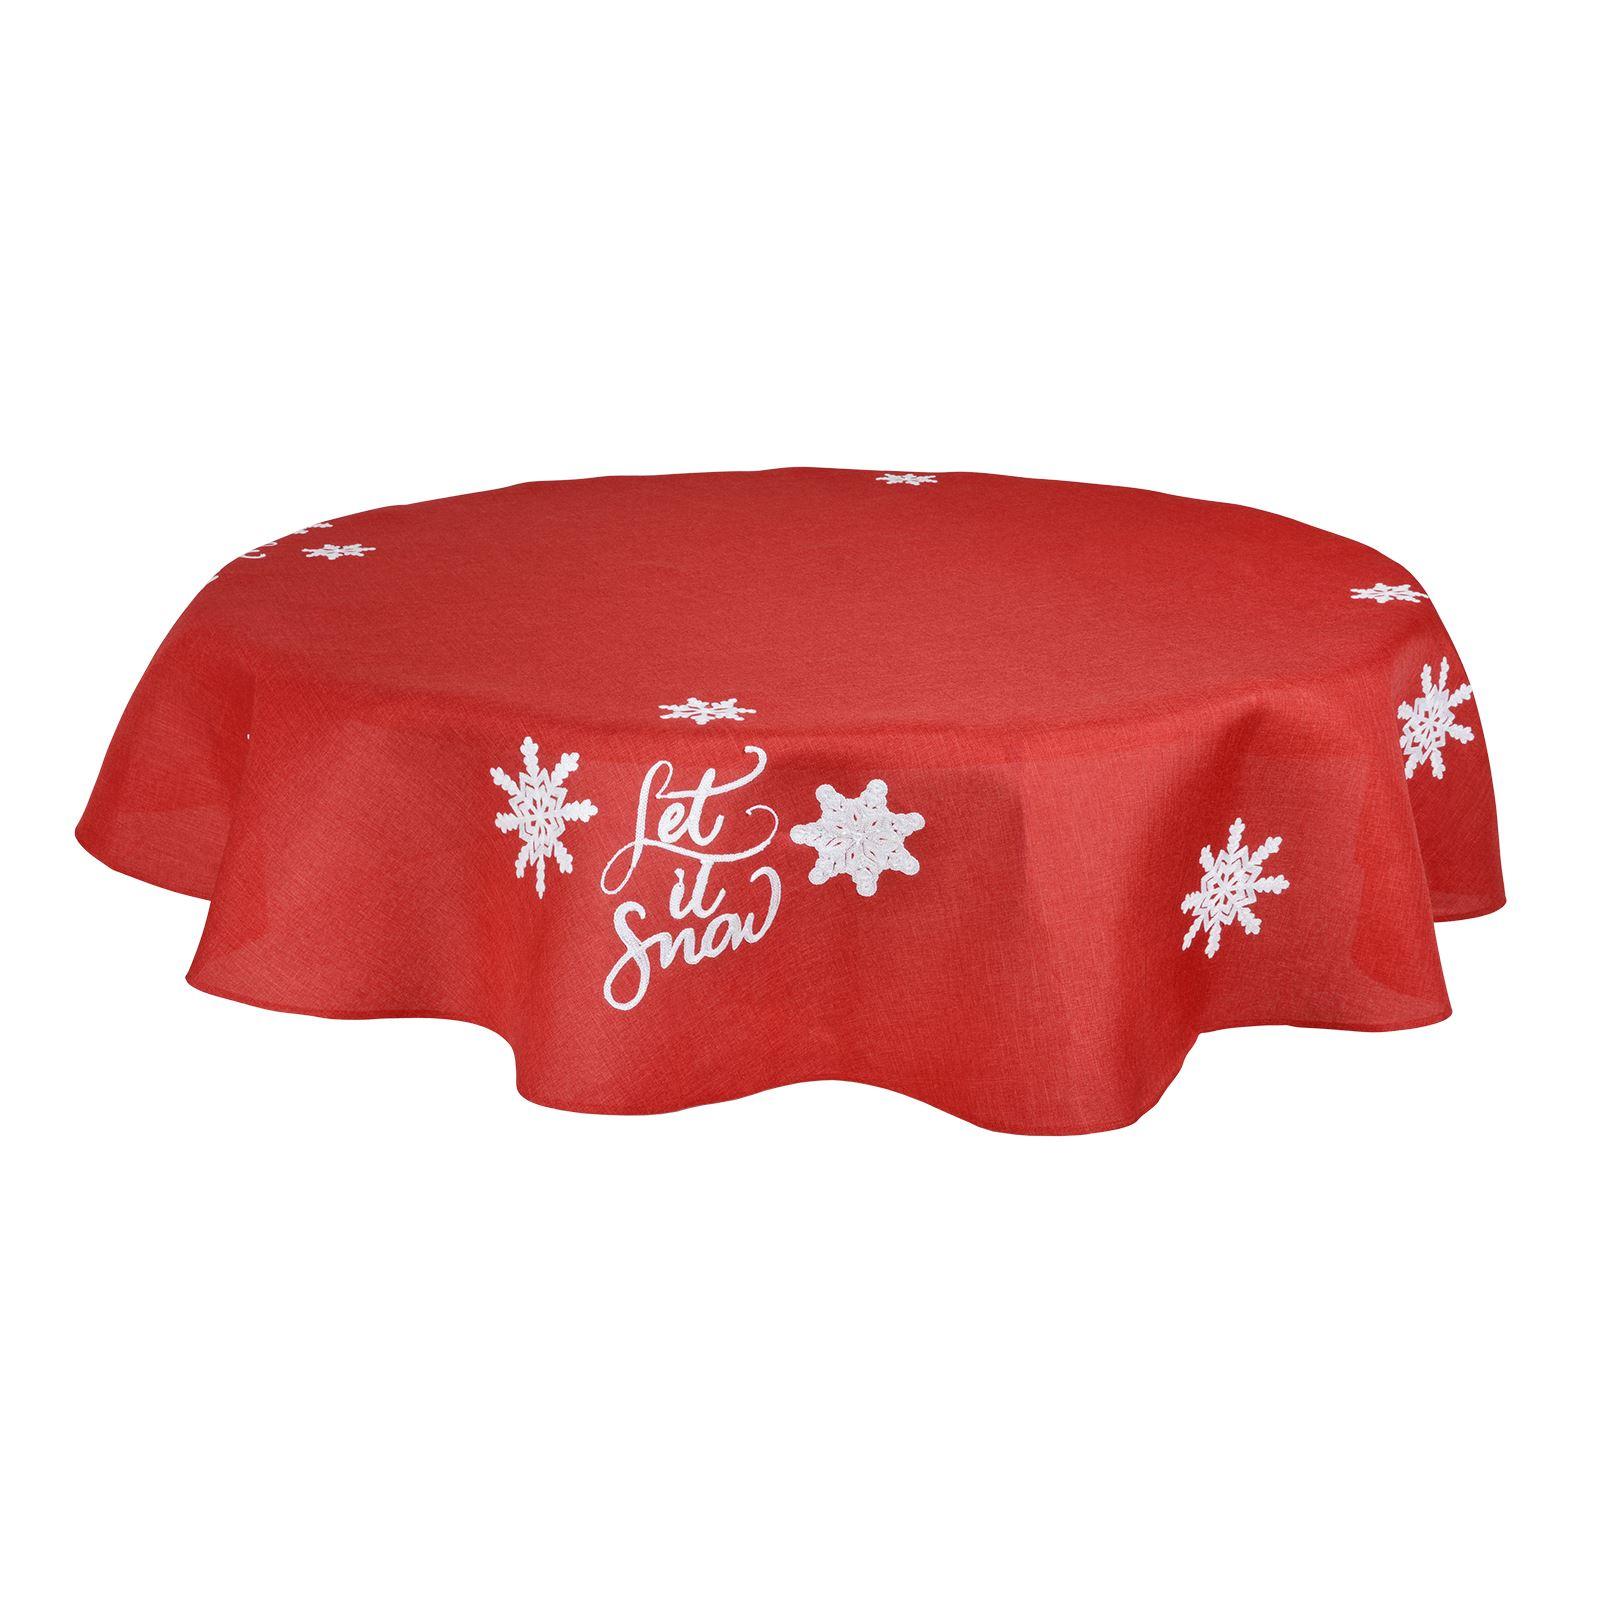 Christmas-Tablecloth-Festive-Pattern-Rectangle-Round-Fabric-Xmas-Room-Decoration Indexbild 107